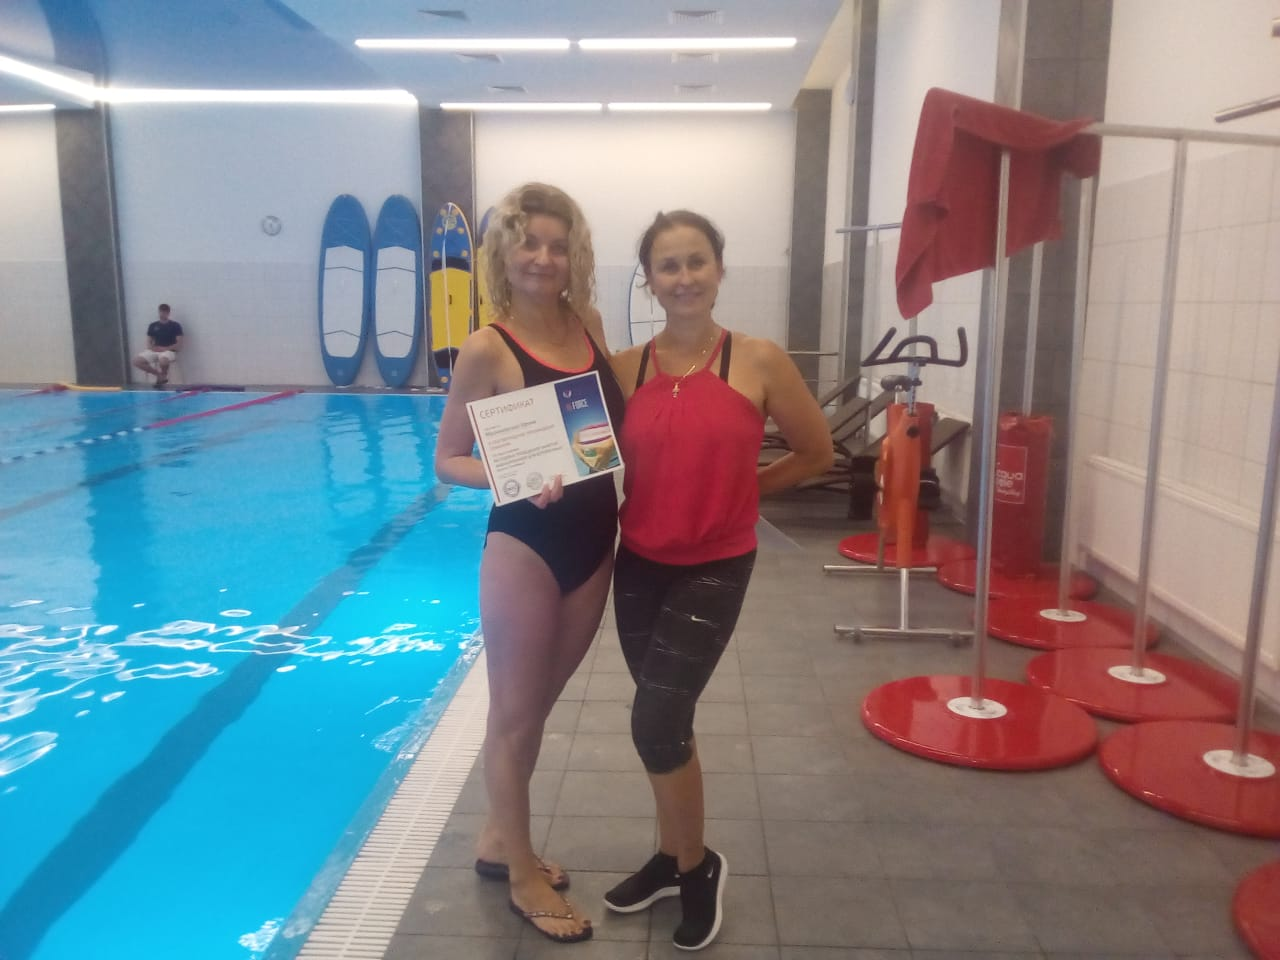 Малиновская Ирина (Спортивная школа по плаванию, г. Вязьма)